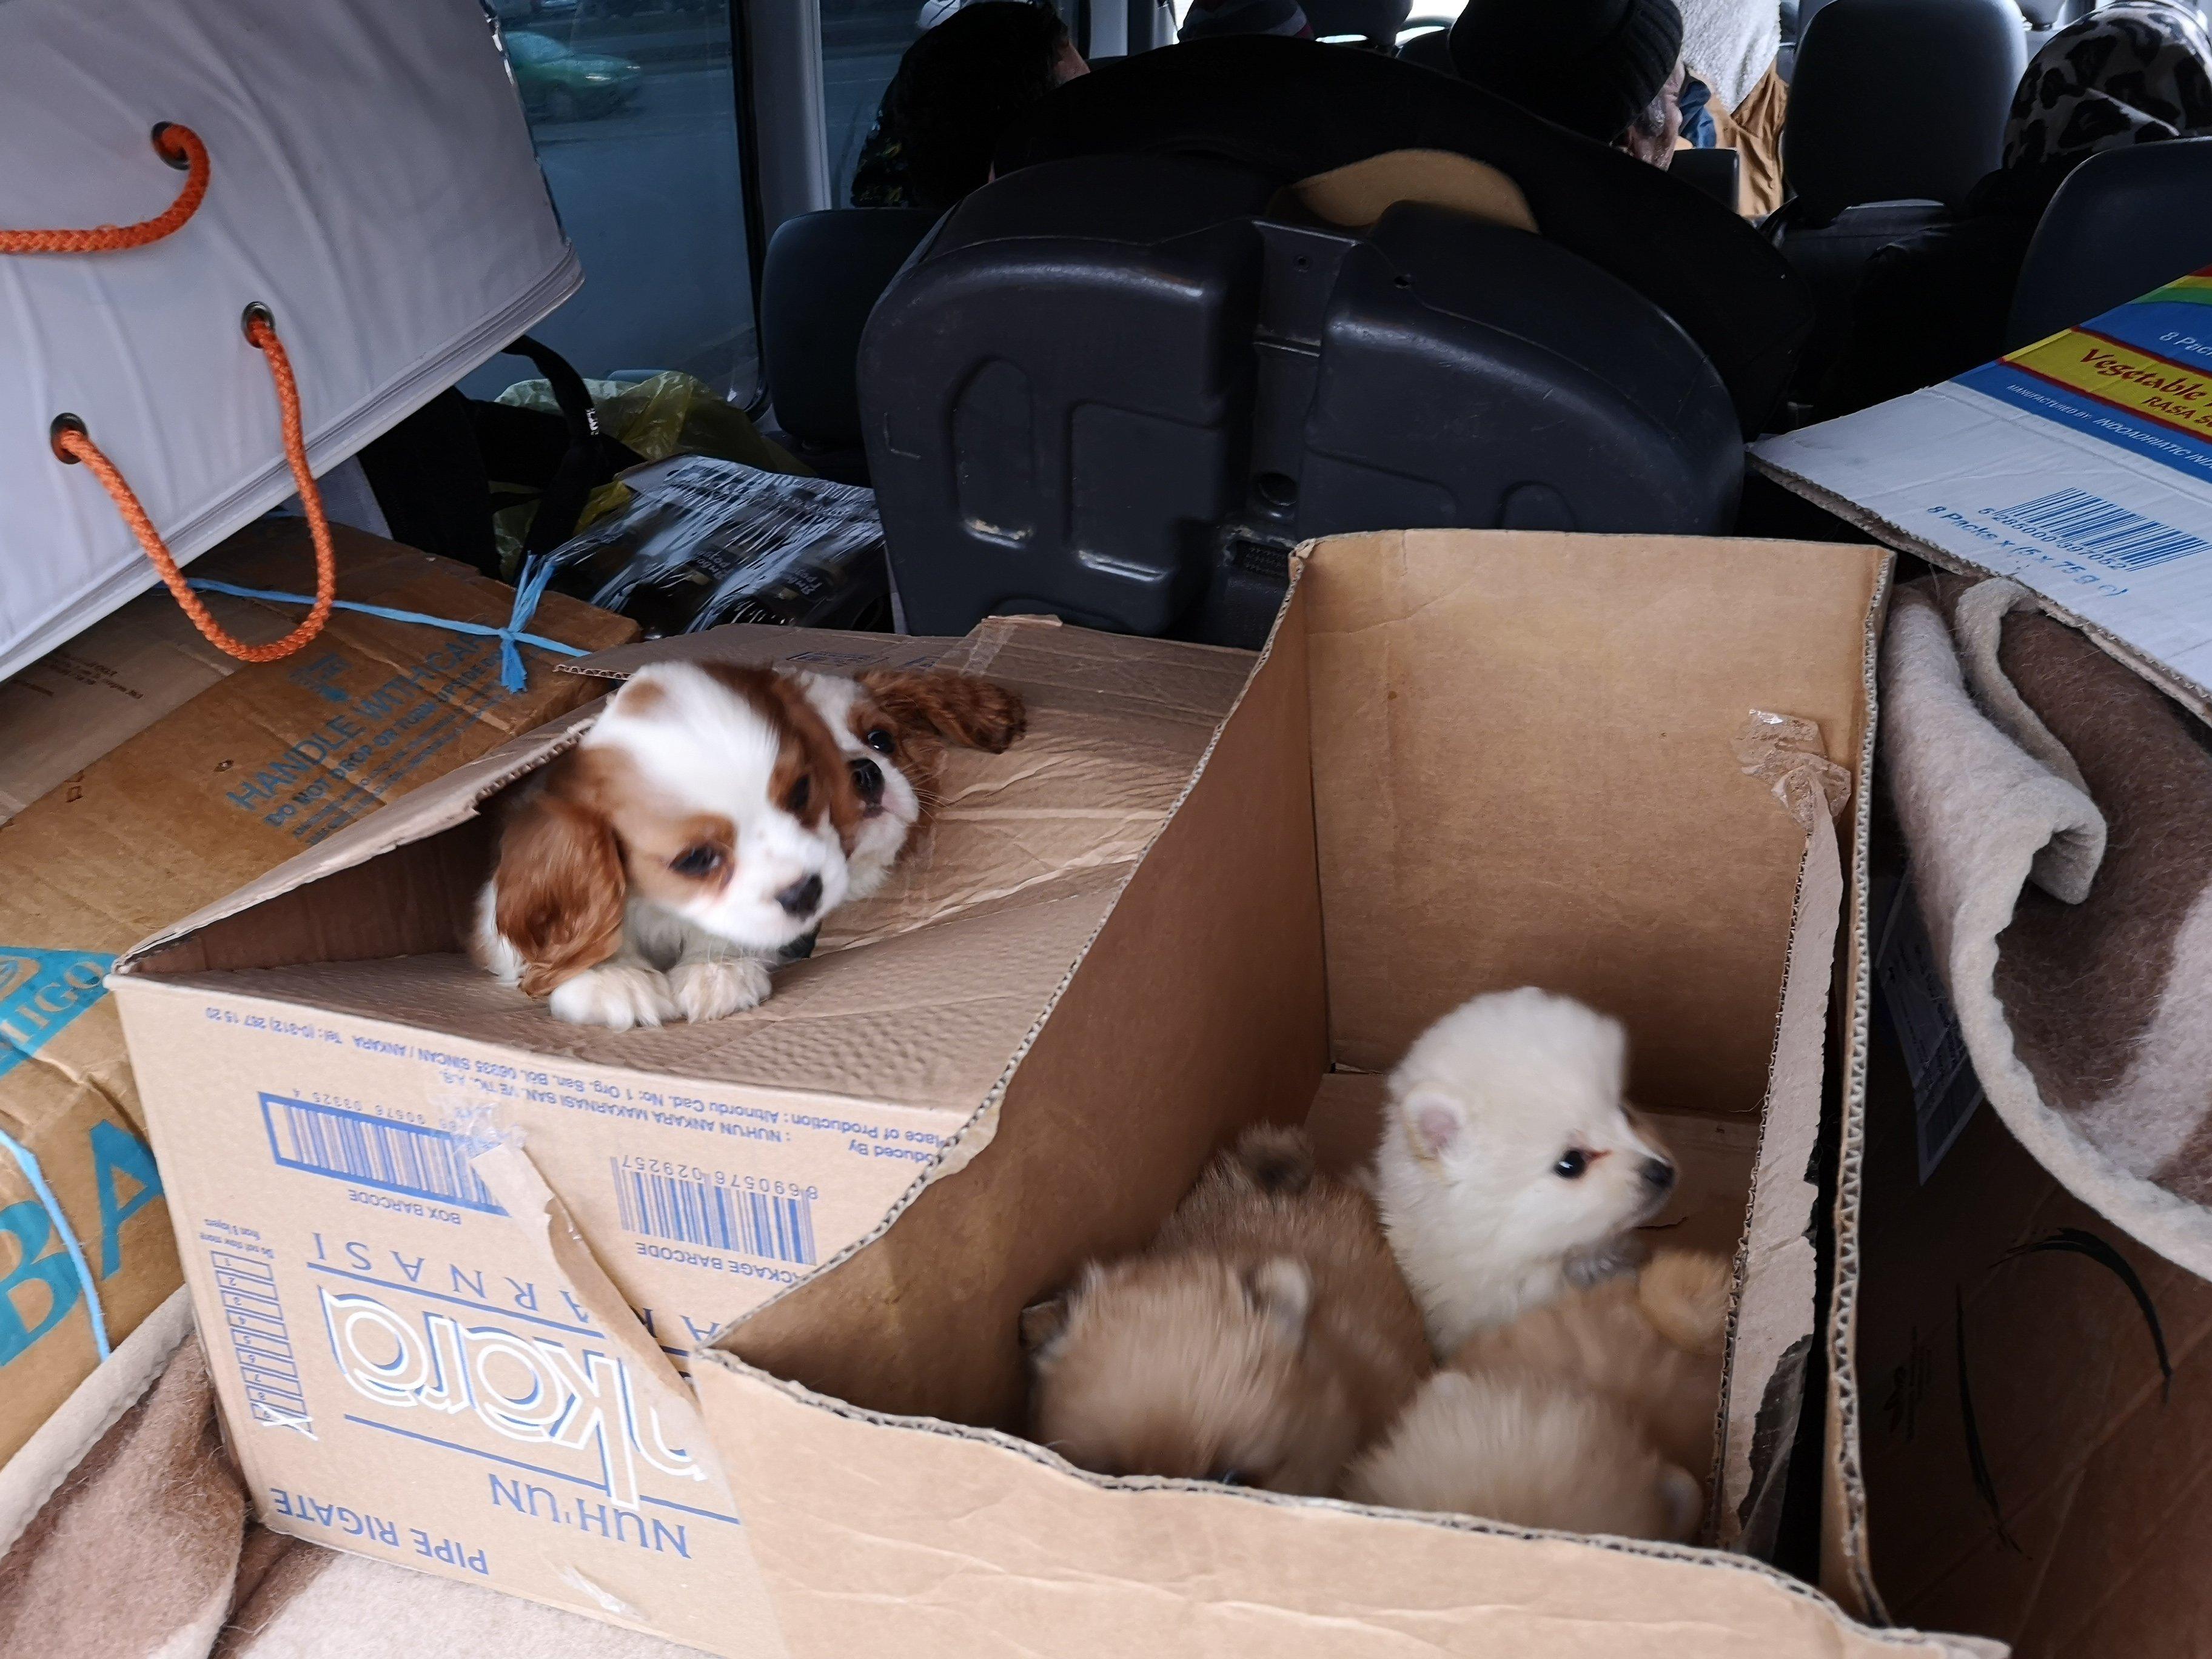 Hunde: Polizisten stoppen Sprinter in Hannover – und retten acht